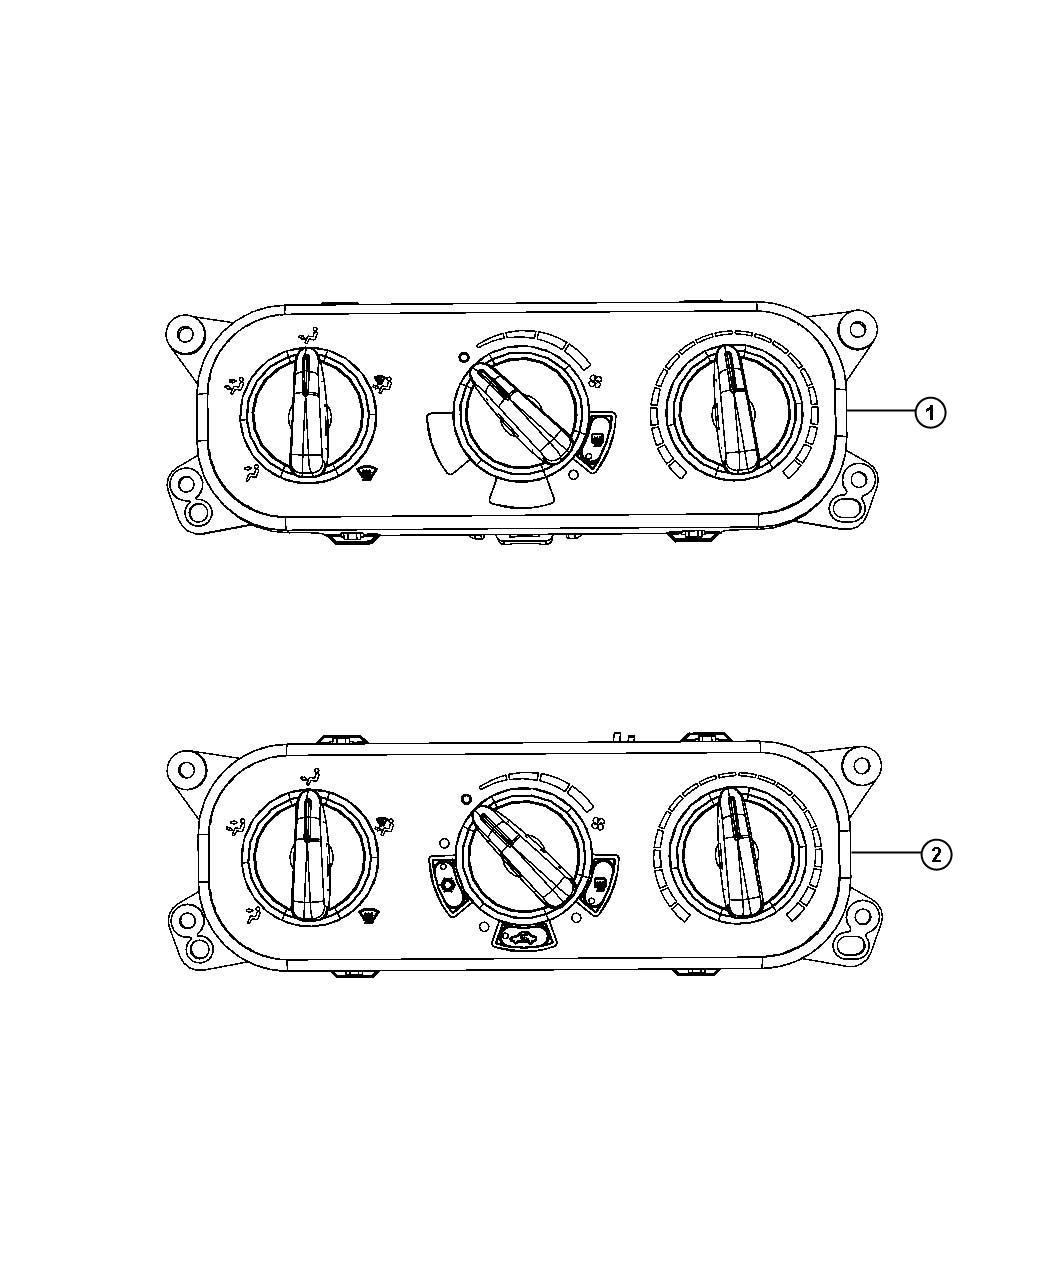 [DIAGRAM] 2001 Jeep Wrangler Heater Control Panel Wiring